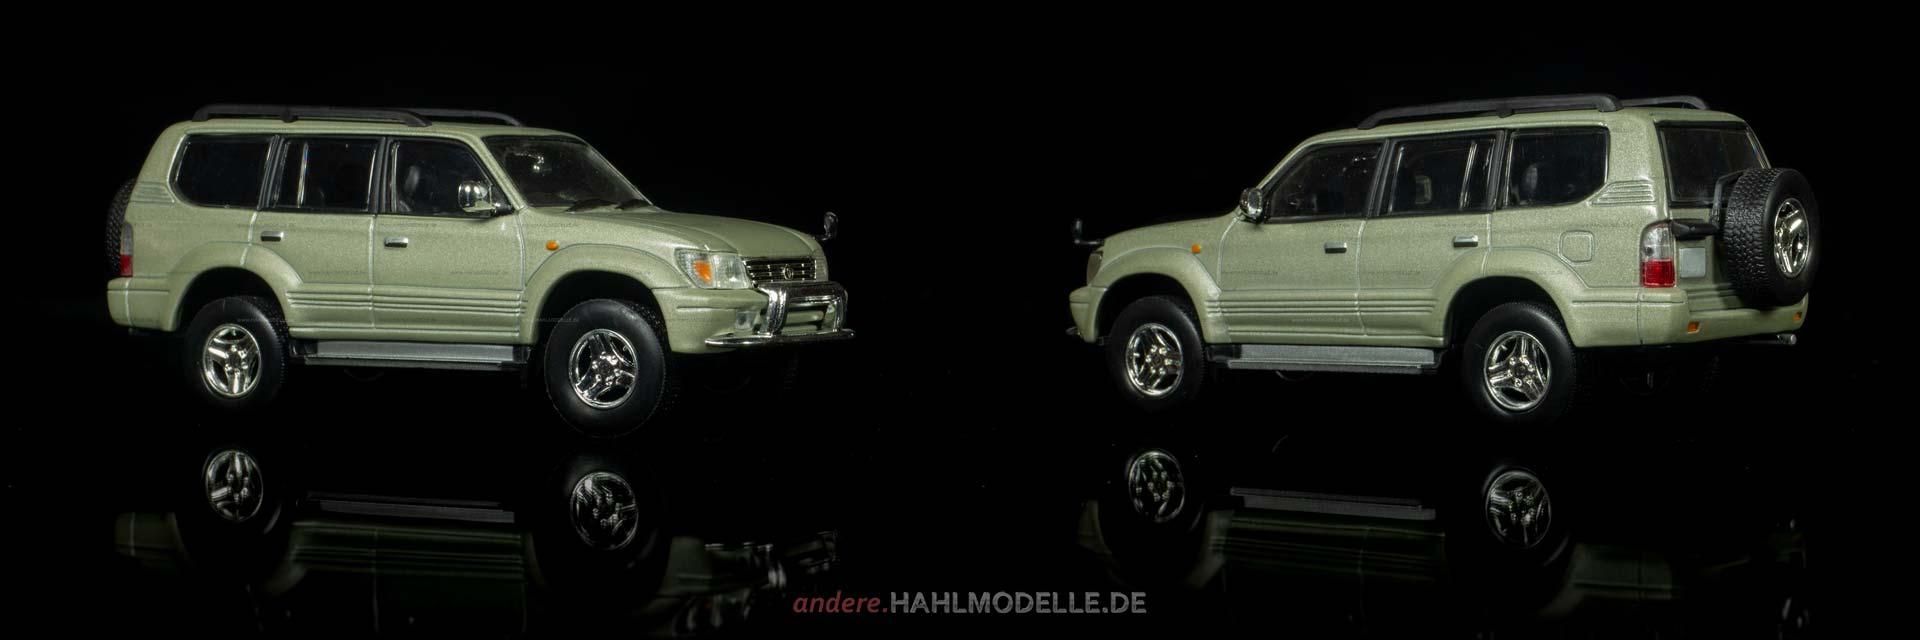 Toyota Land Cruiser J100 | Geländewagen | Ixo | 1:43 | www.andere.hahlmodelle.de